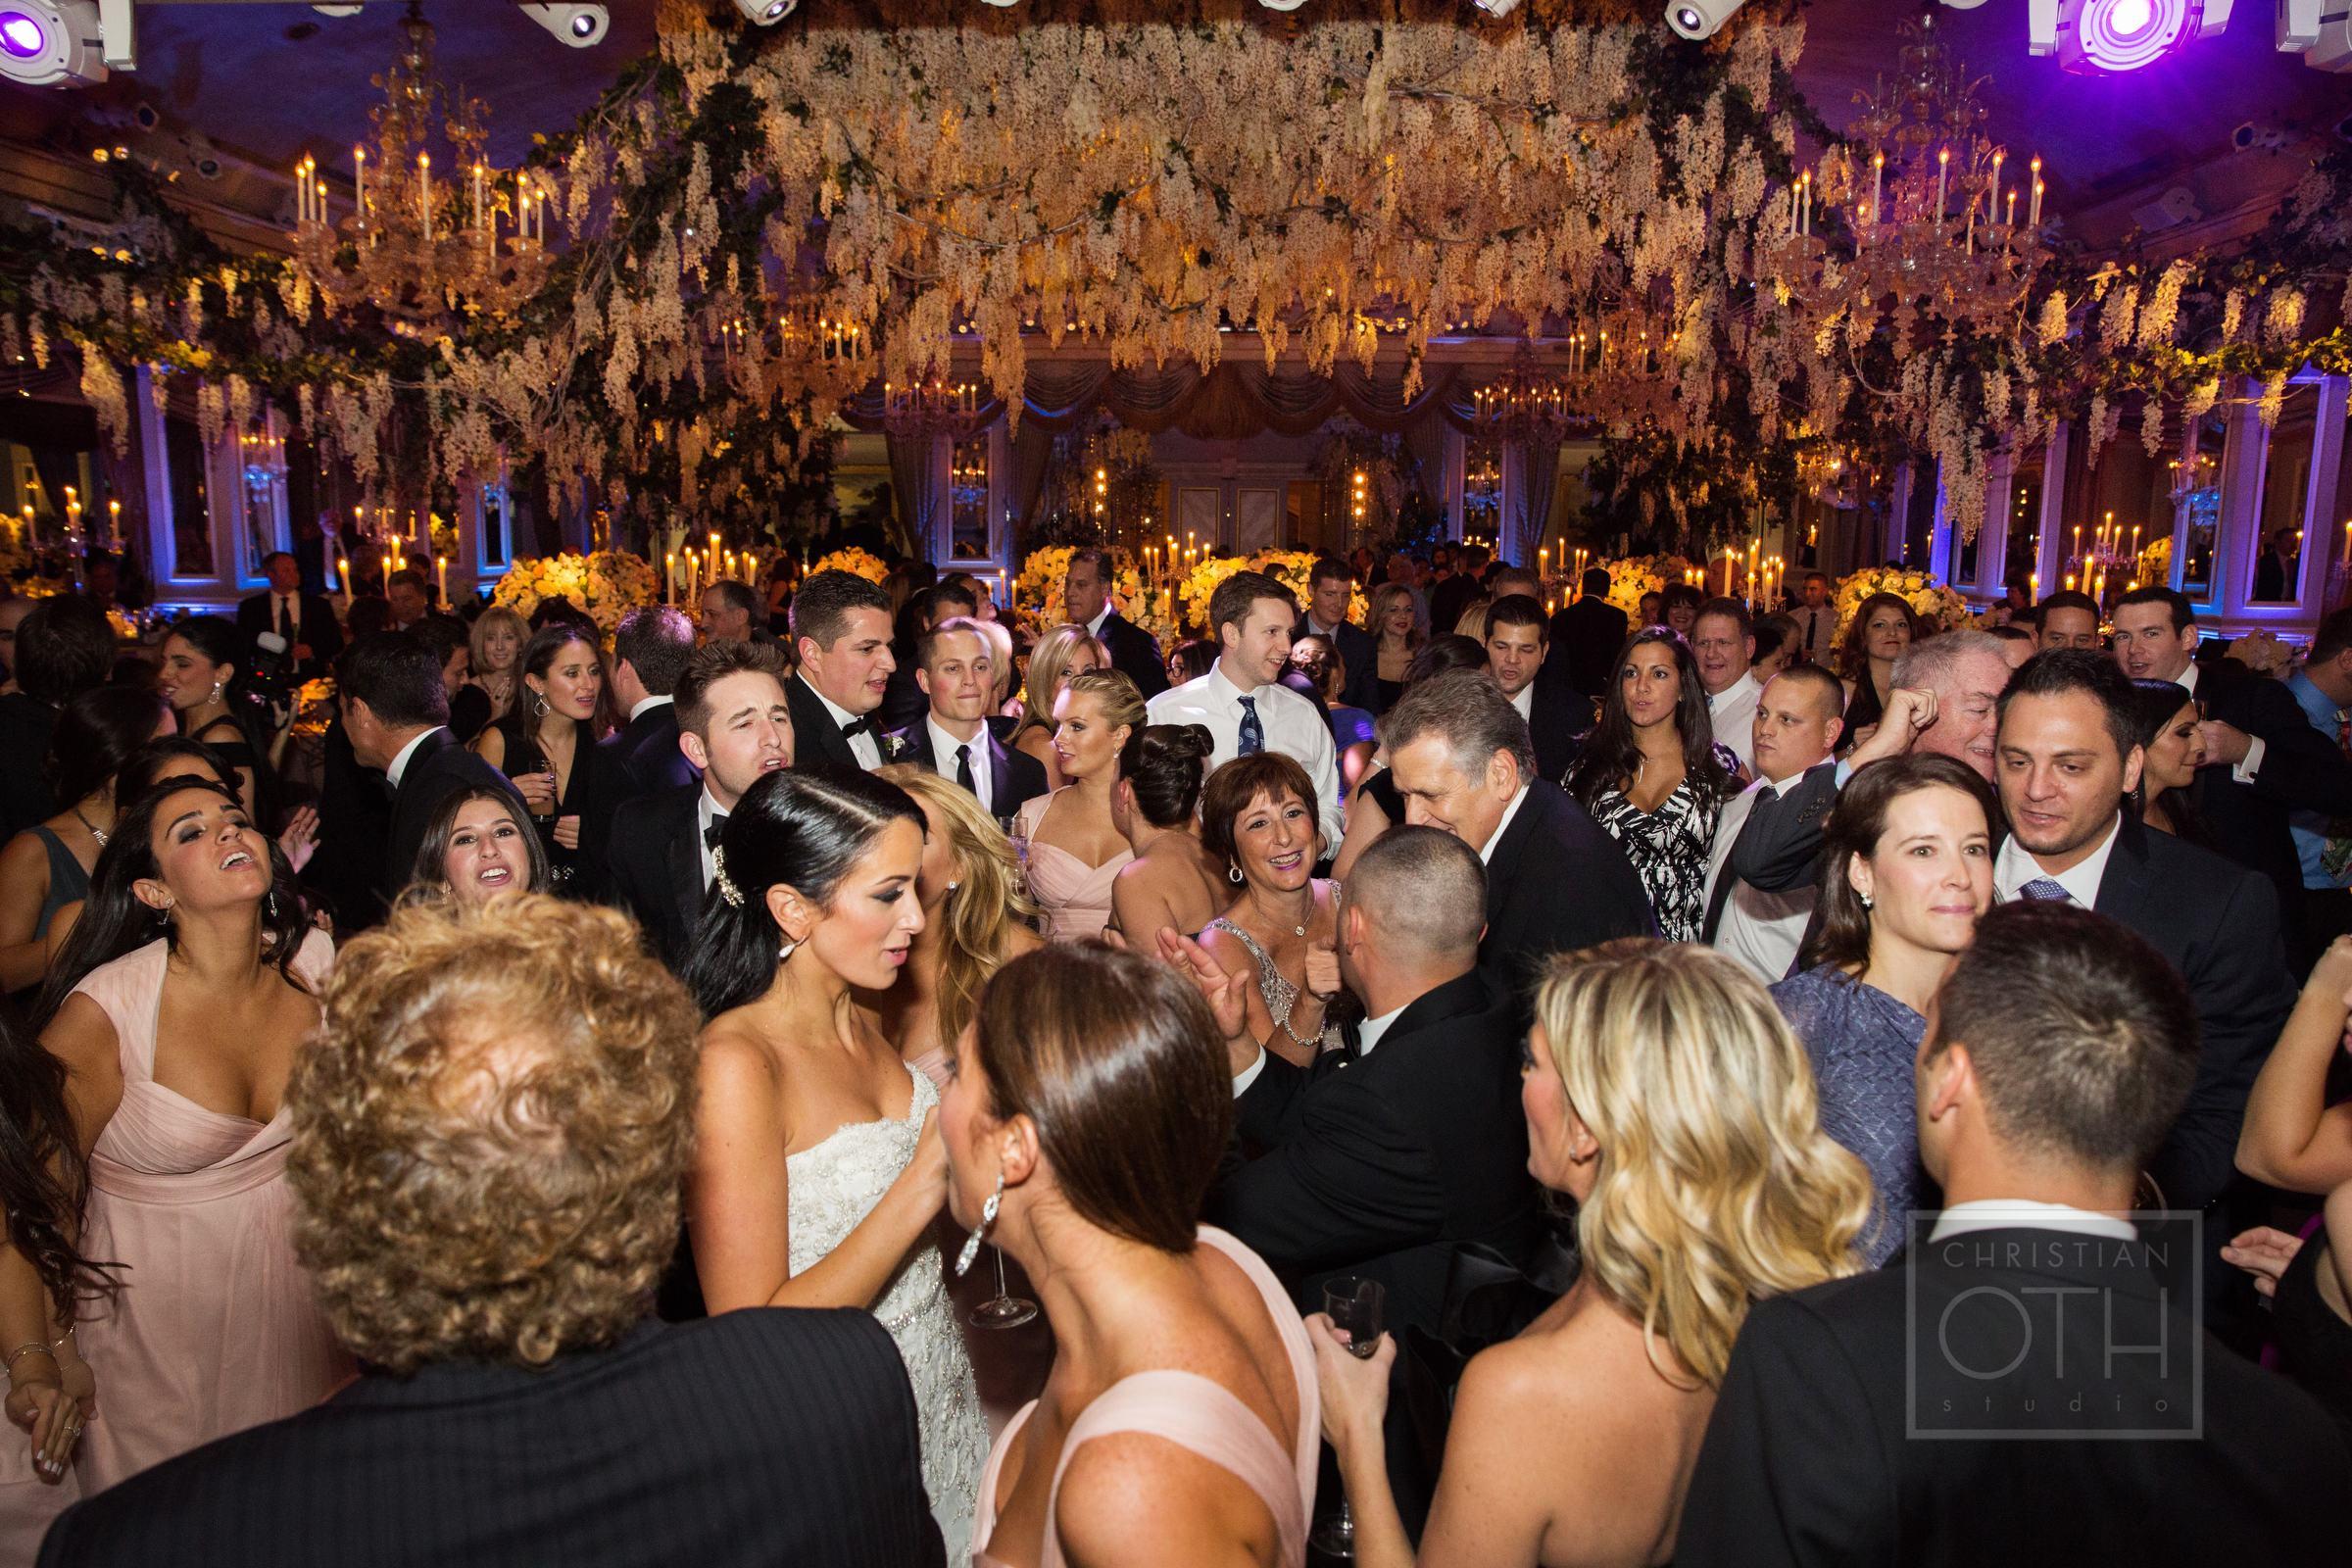 Ceci_New_York_Custom_Invitation_Pierre__City_ Destination_Wedding_Luxury_Personalized_Ceci_Style_Bride_Rose_Gold_Foil_Stamping141.JPG